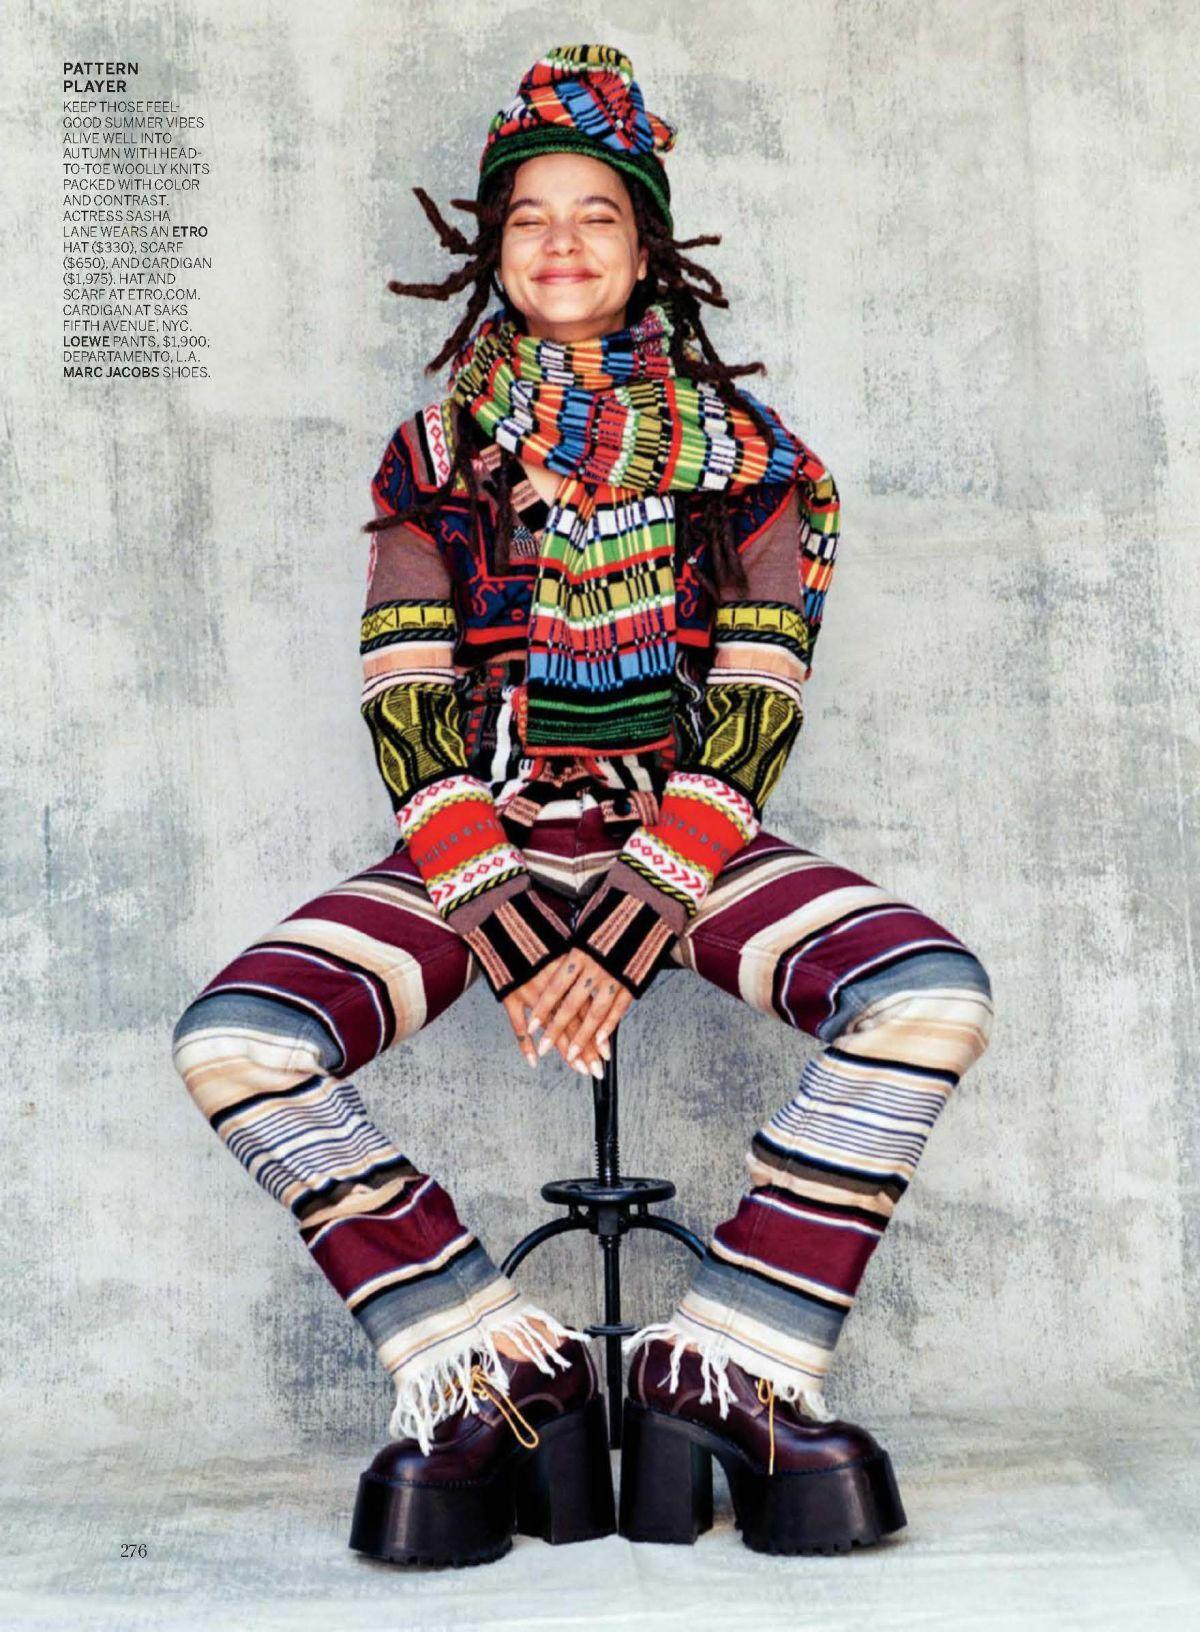 SASHA LANE for Vogue Magazine, October 2017